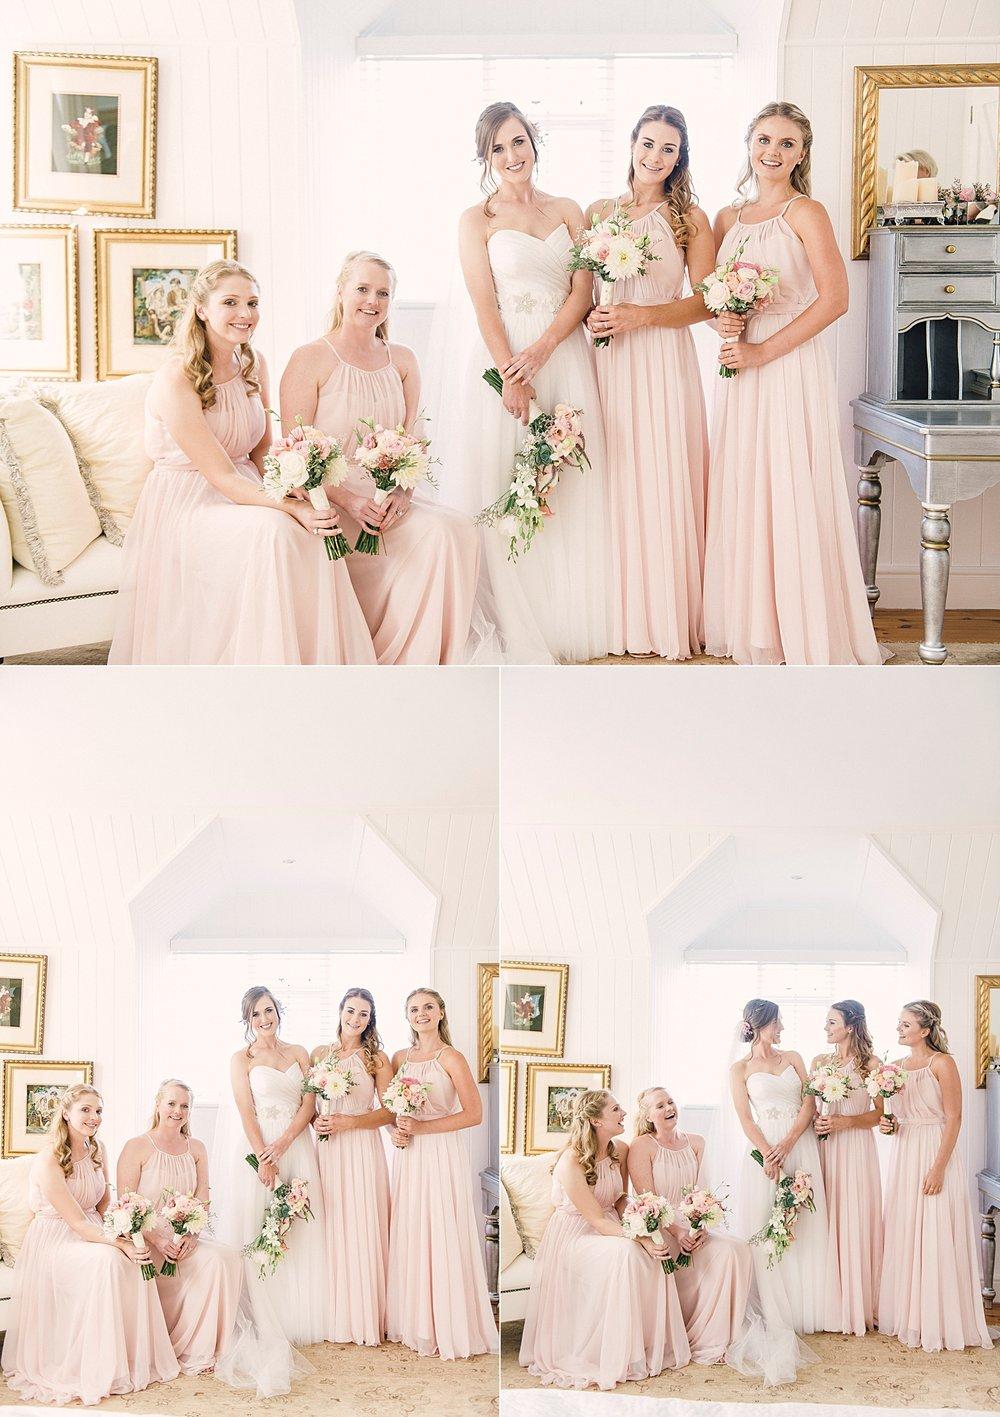 RyanParker_WeddingPhotographer_CapeTown_BonaDea_Hermanus_S&A_DSC_1492.jpg